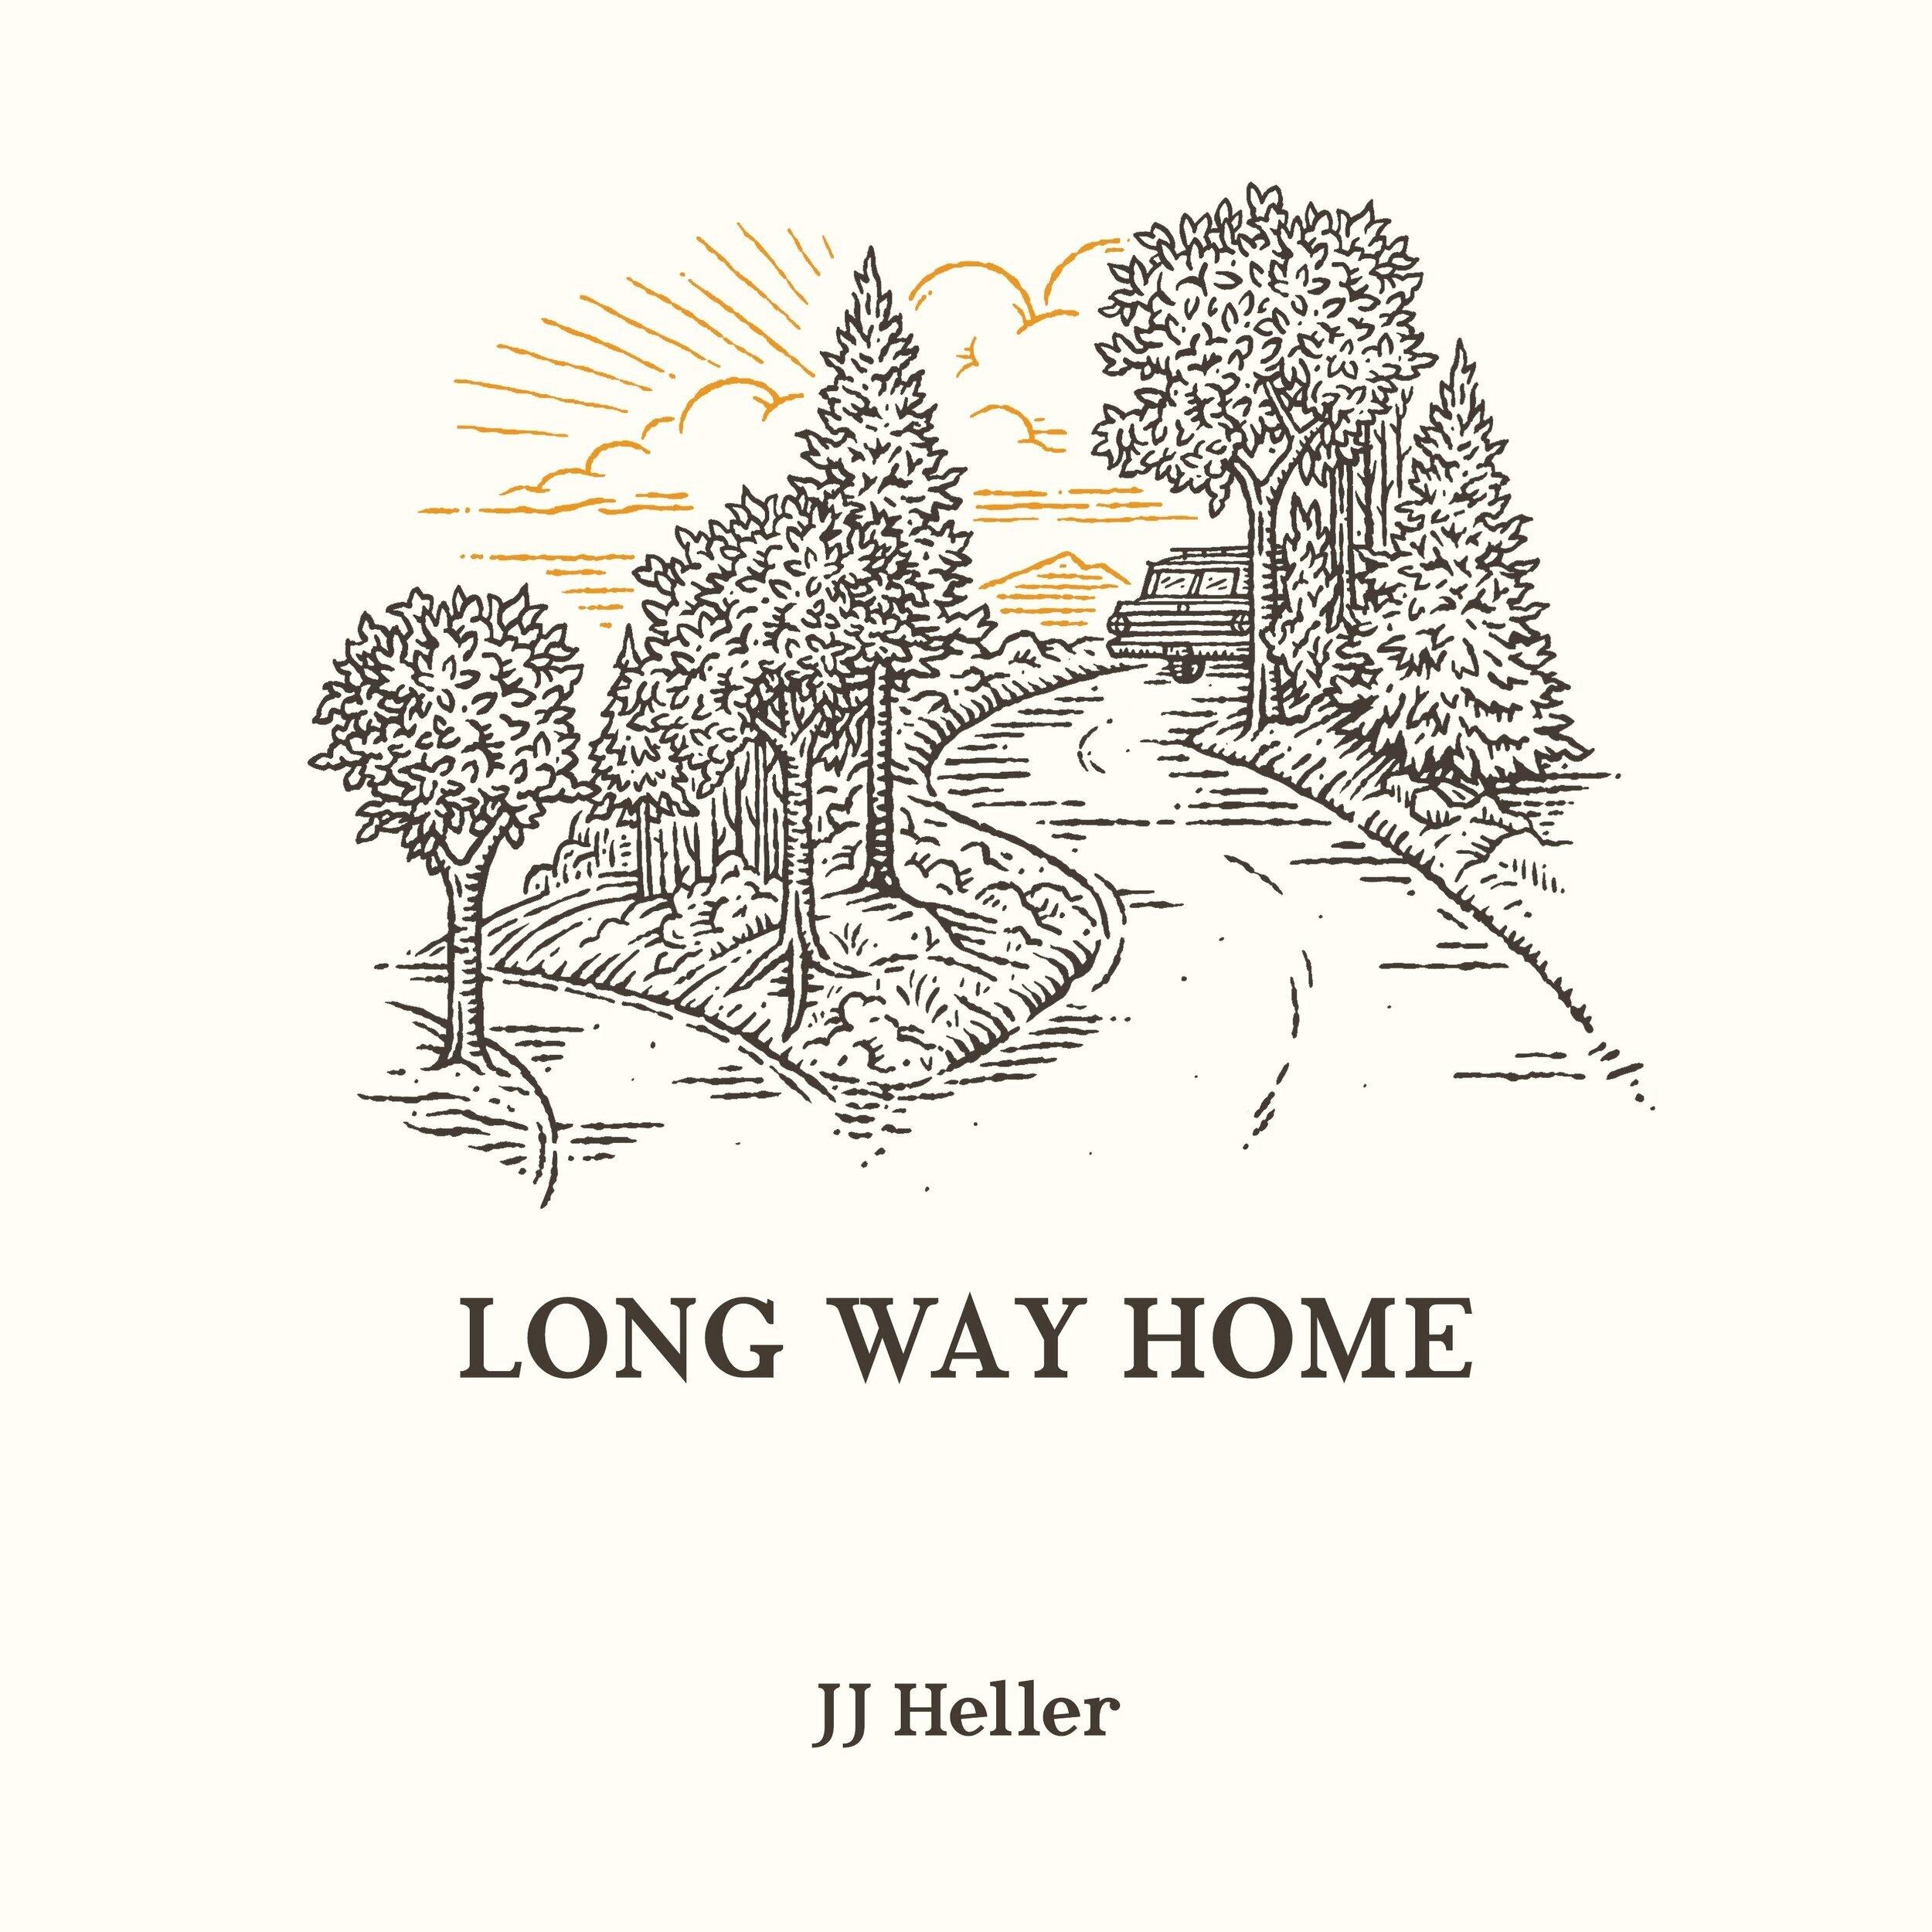 Long Way Home Cover.JPG